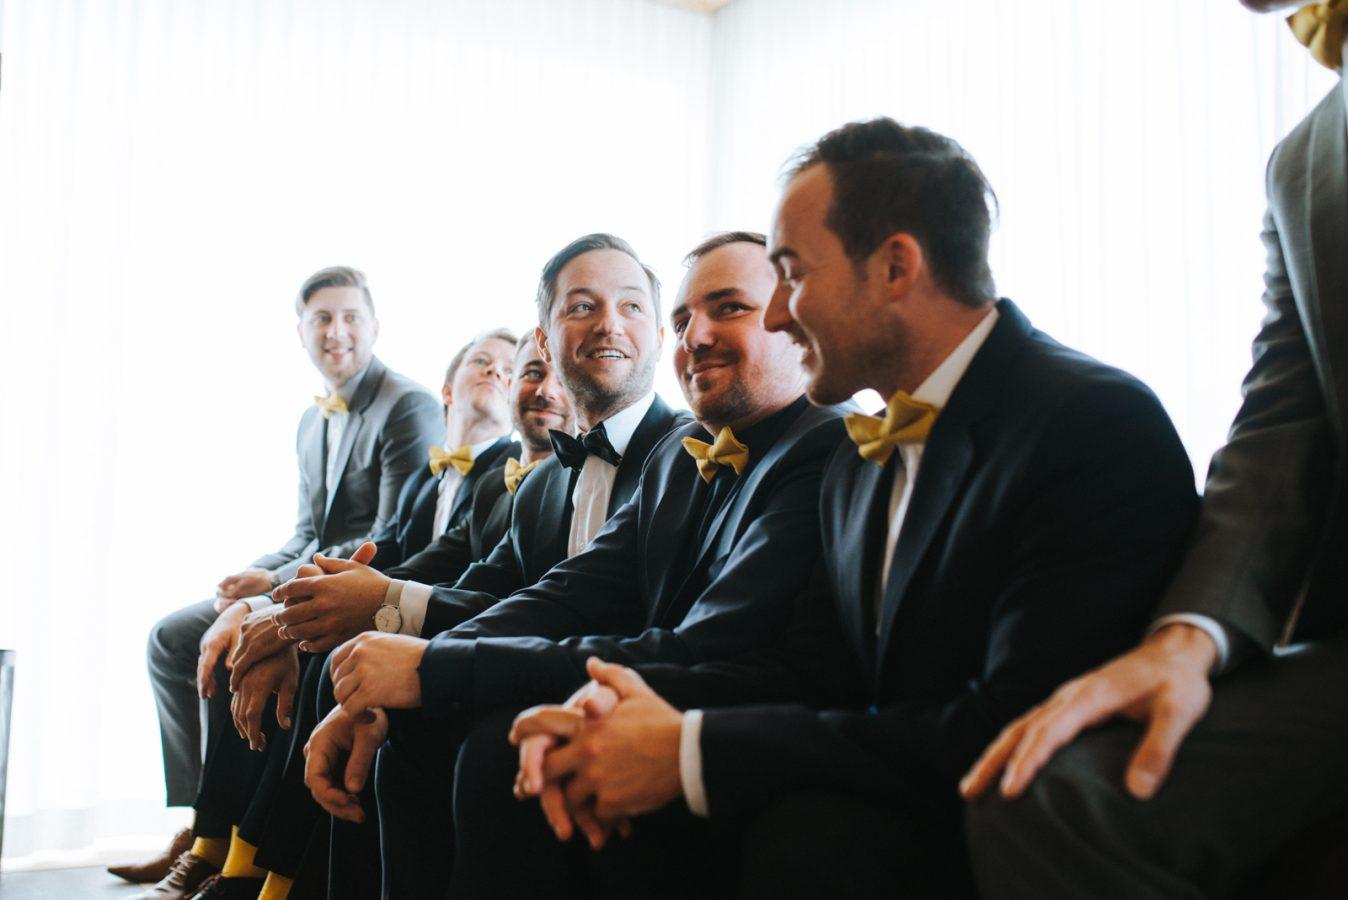 Boho Vintage Wedding Kitzbühel-25